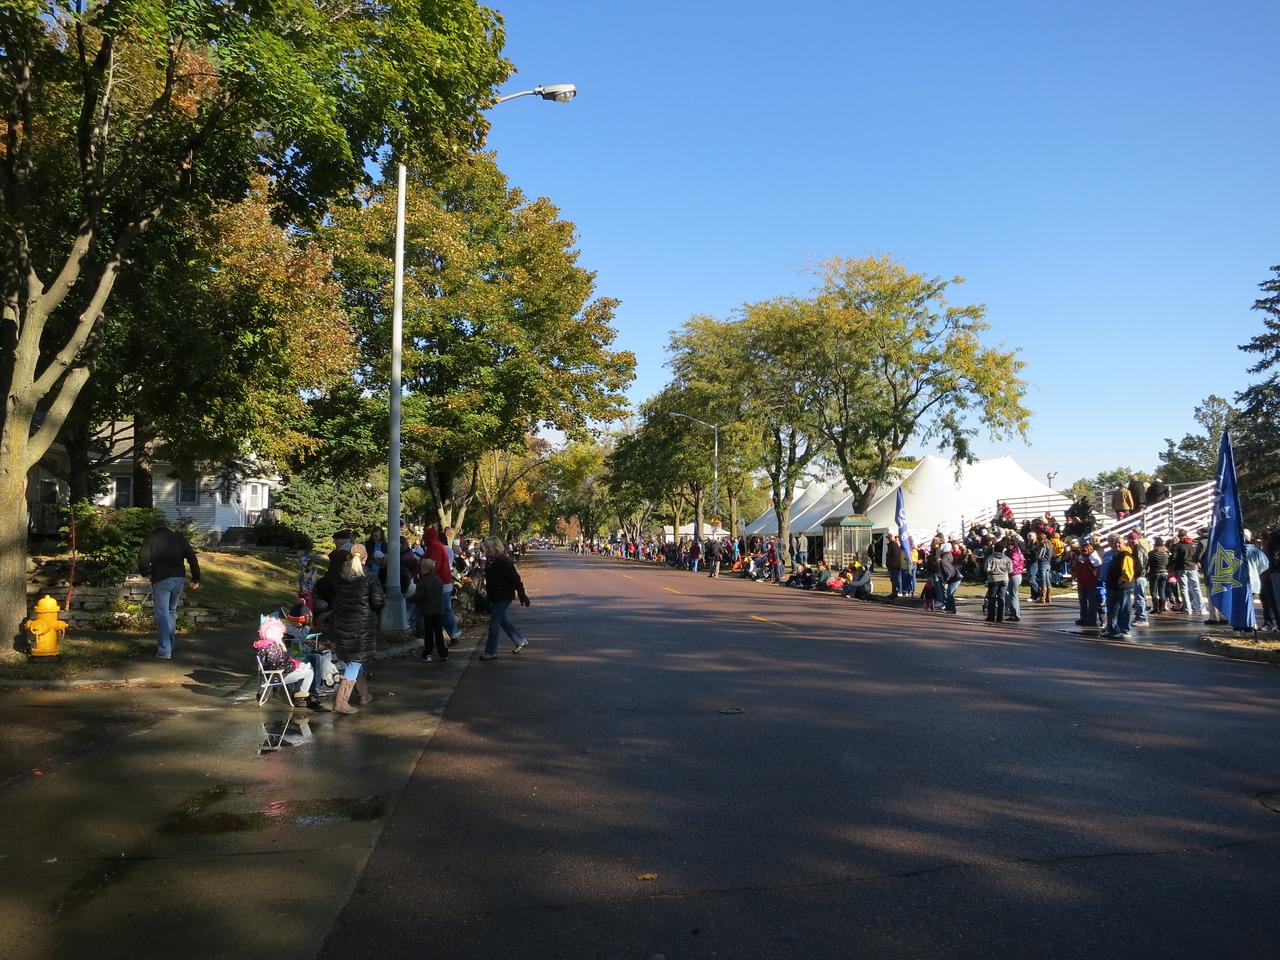 Homecoming parade<br /> October 19, 2013